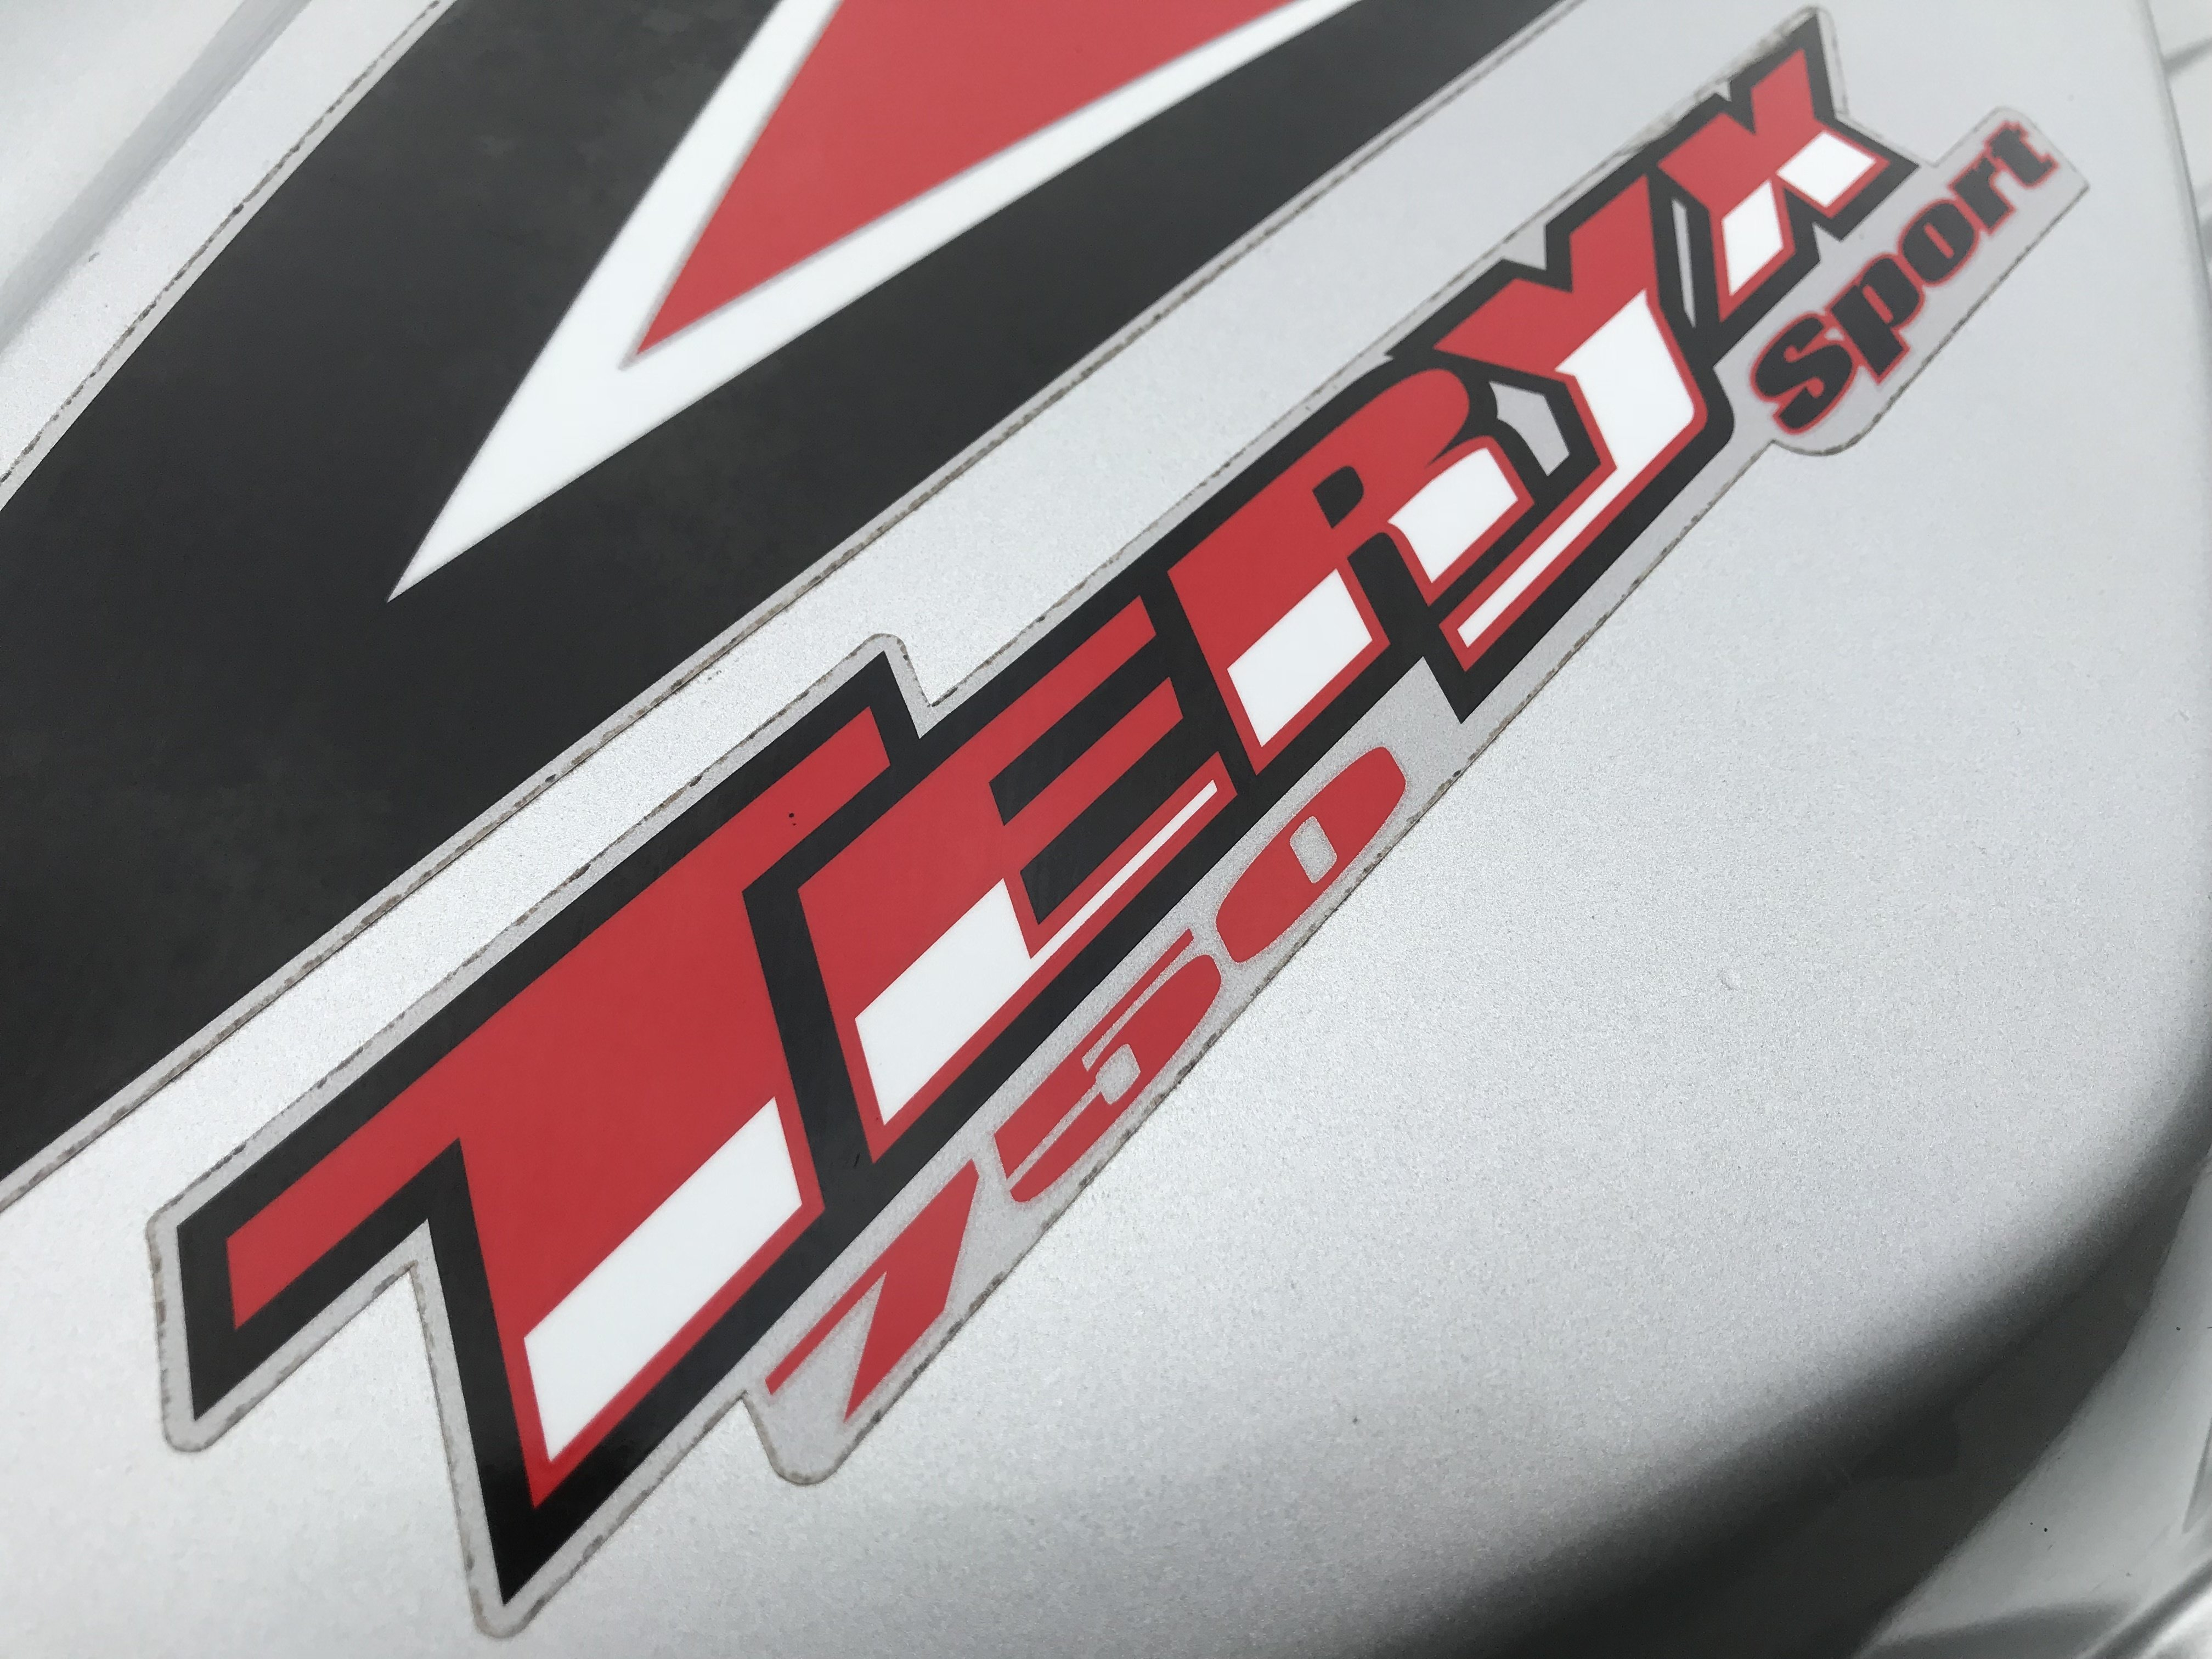 2011 Kawasaki Teryx 750 Sport Special Edition